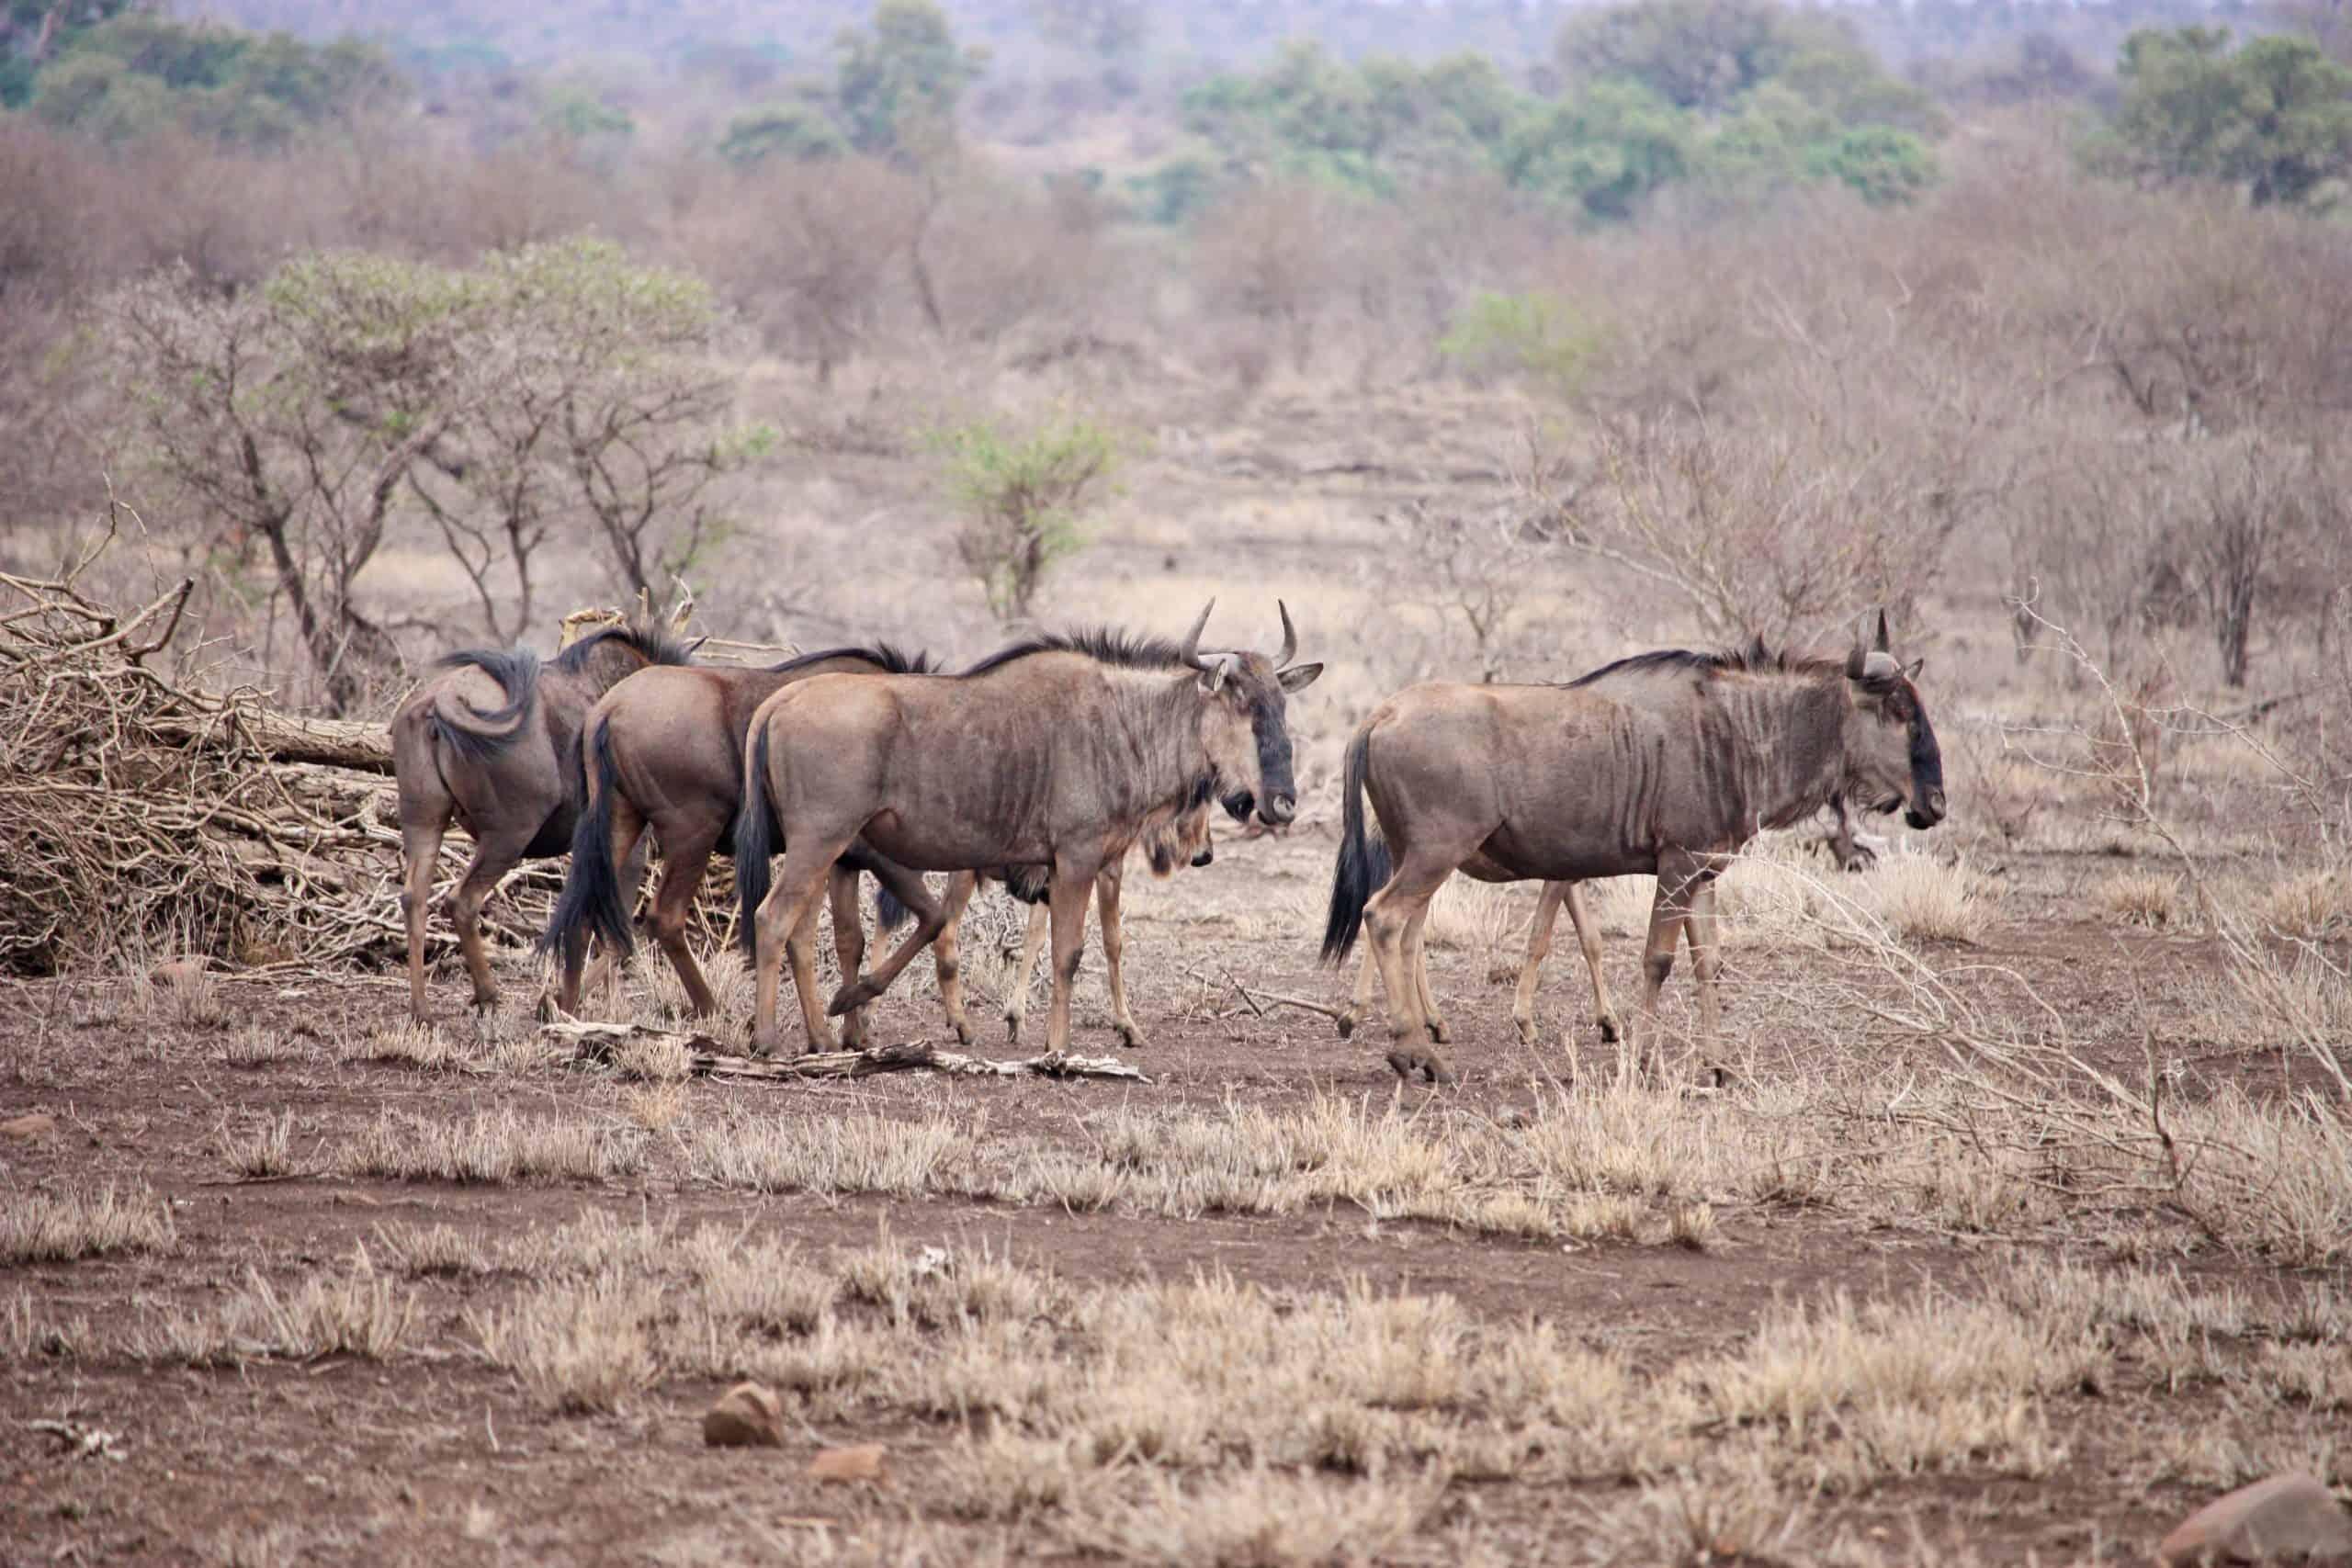 Burigi Chato Safaris Co. Ltd Serengeti Norongoro Safari Best Tour Agency Company Operator In Moshi Arusha Tanzania Africa) (23)